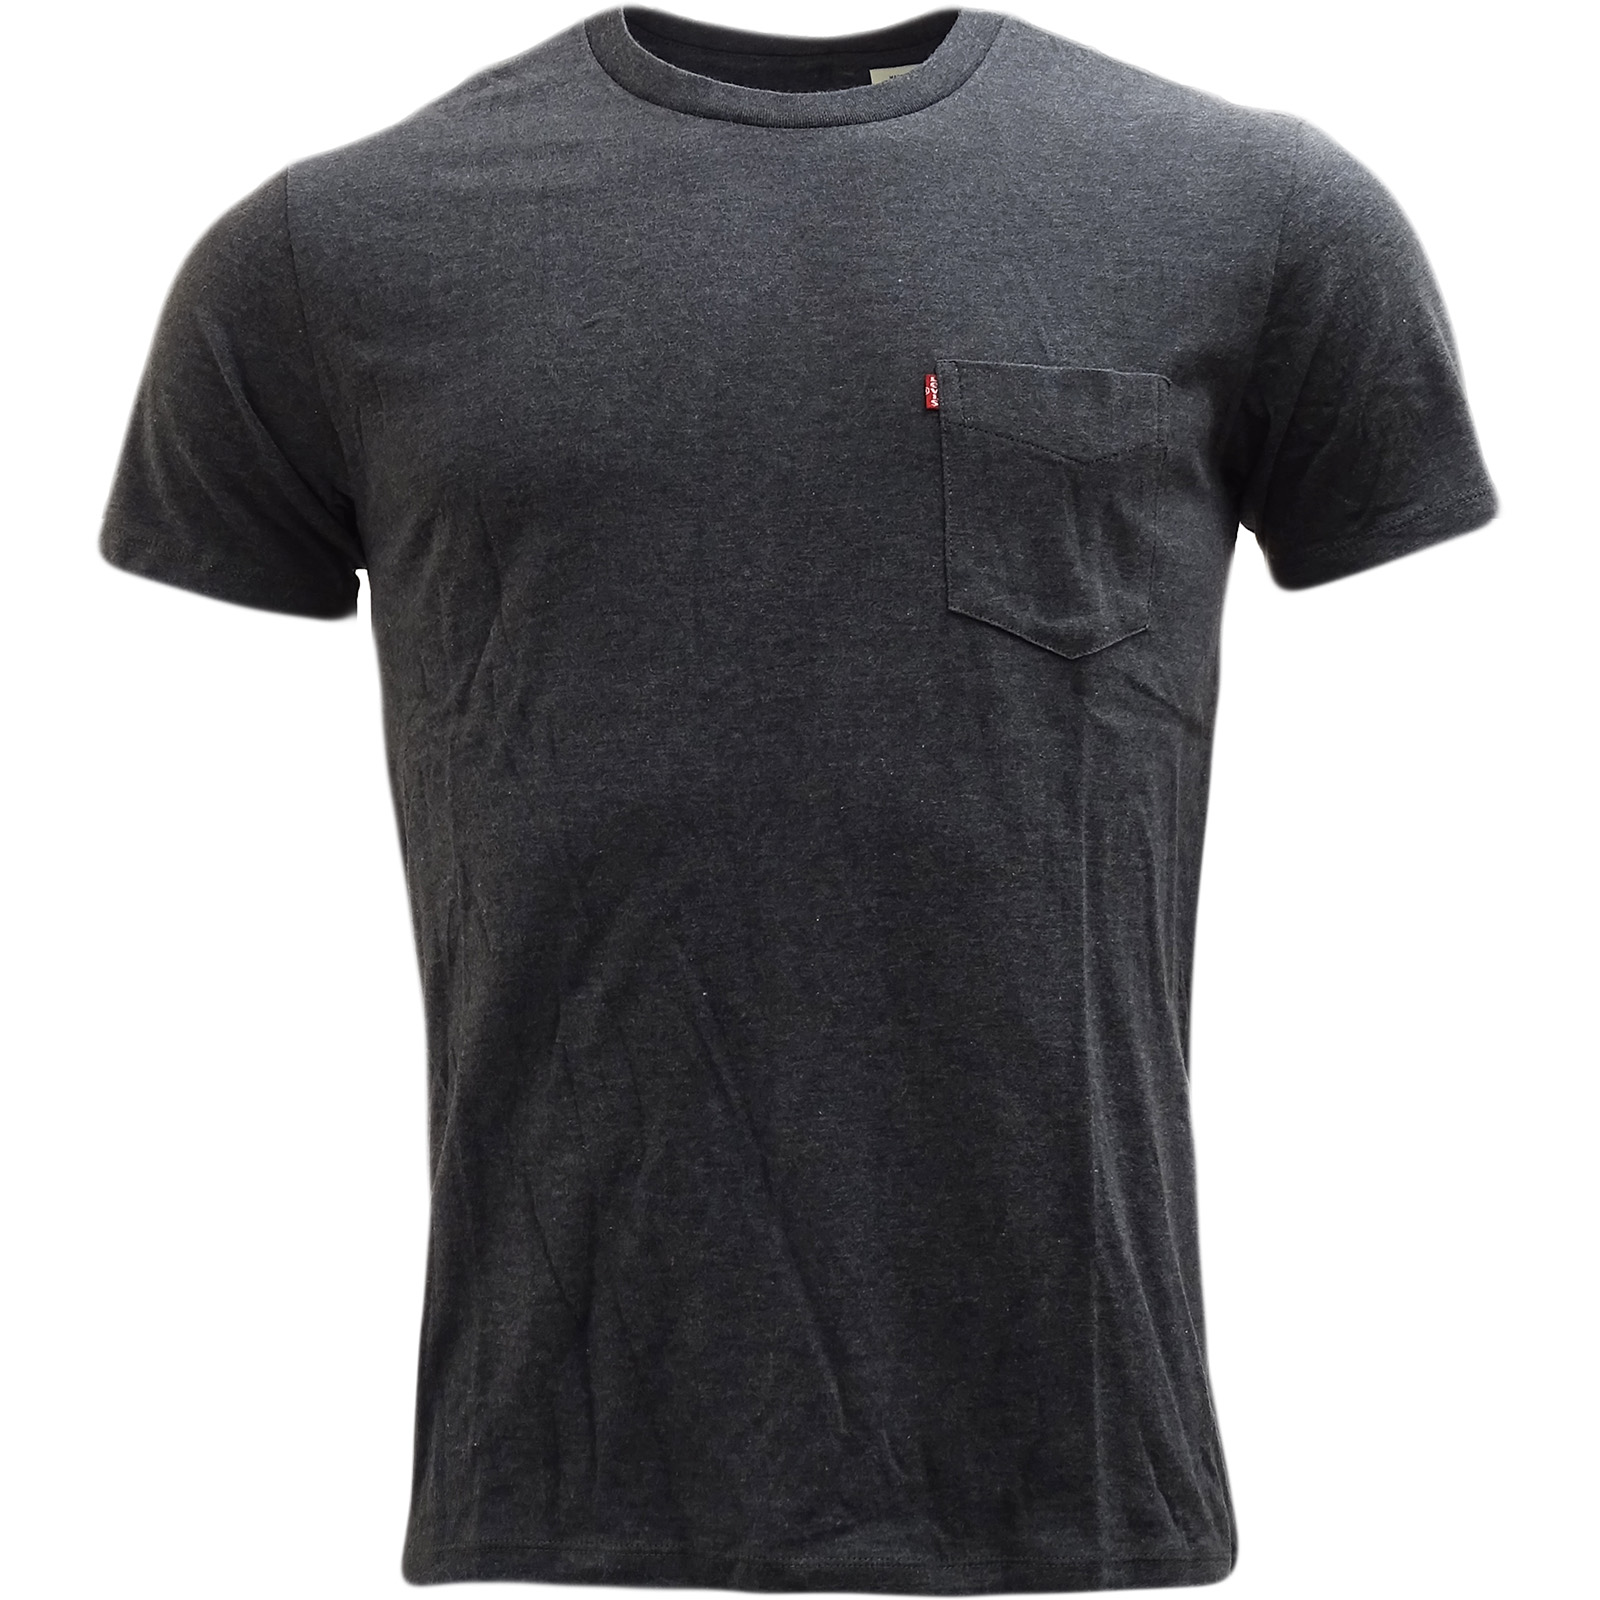 Levi strauss plain sunset pocket tee levi 39 s t shirt for Levis plain t shirts